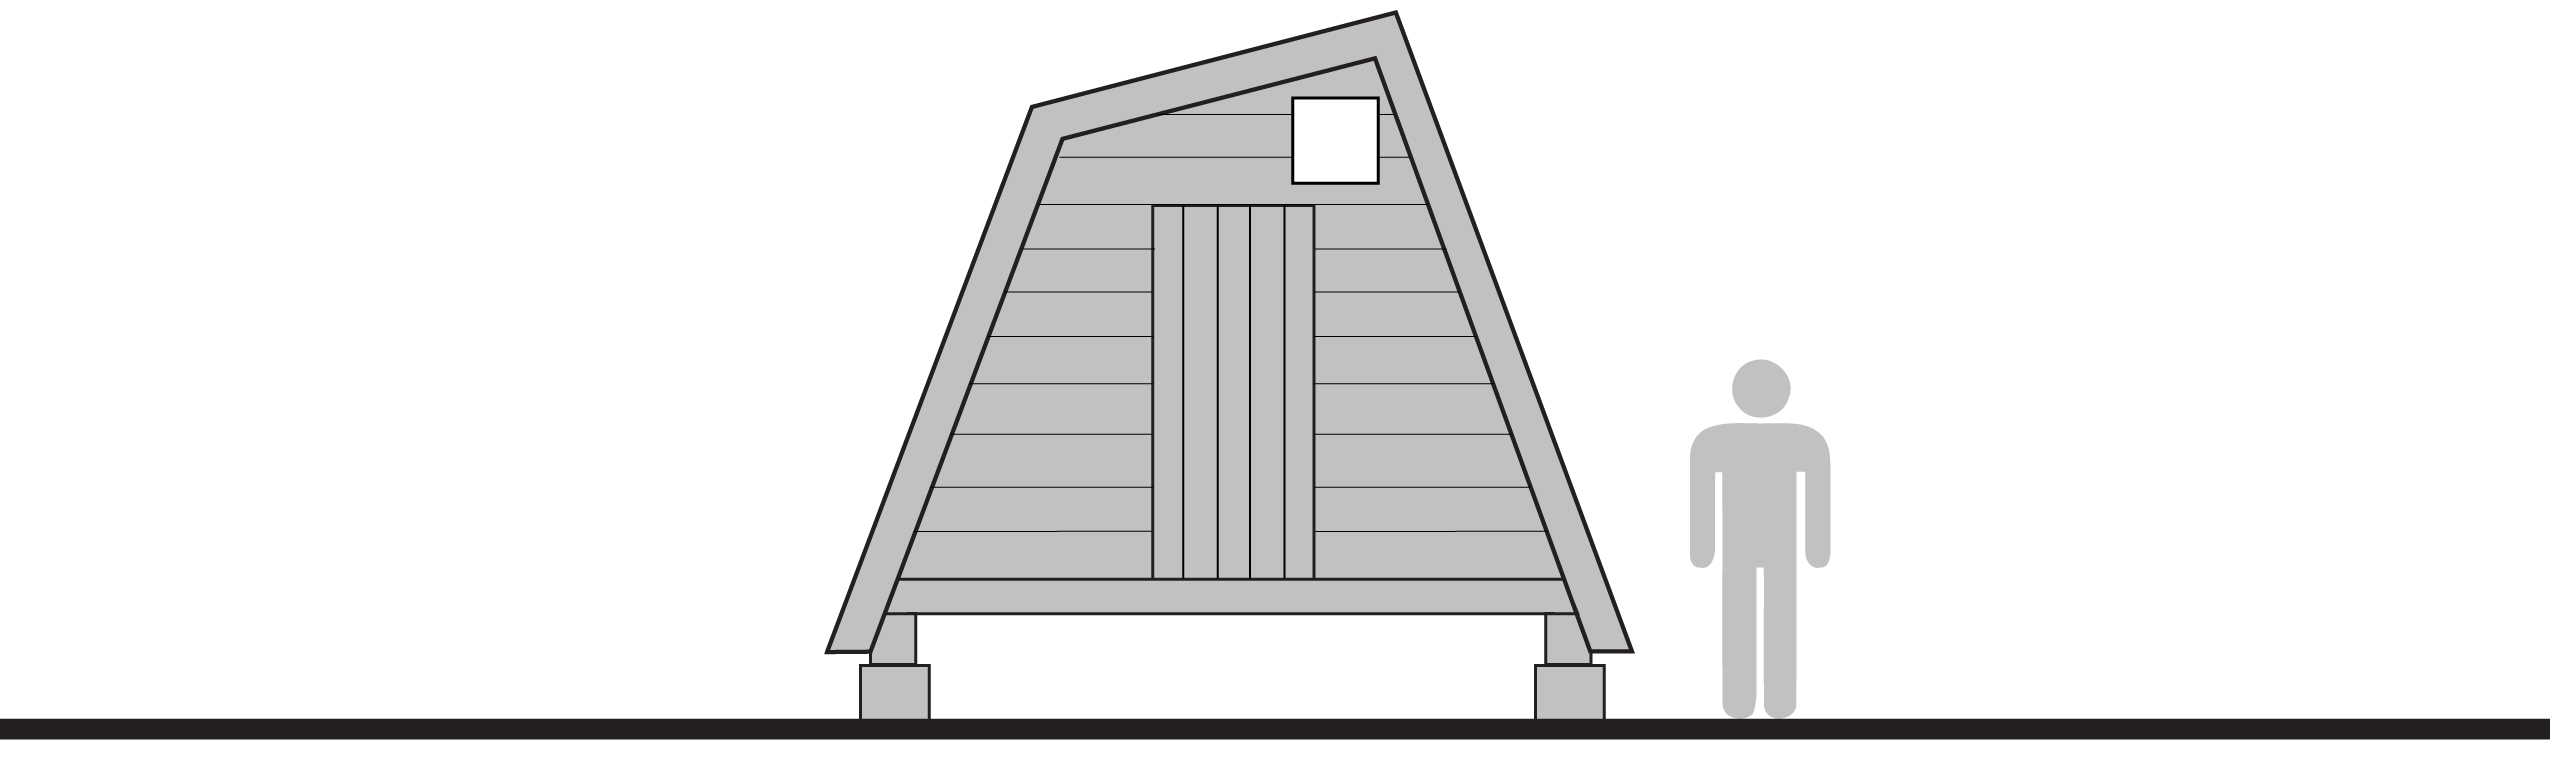 Bivouac Stol